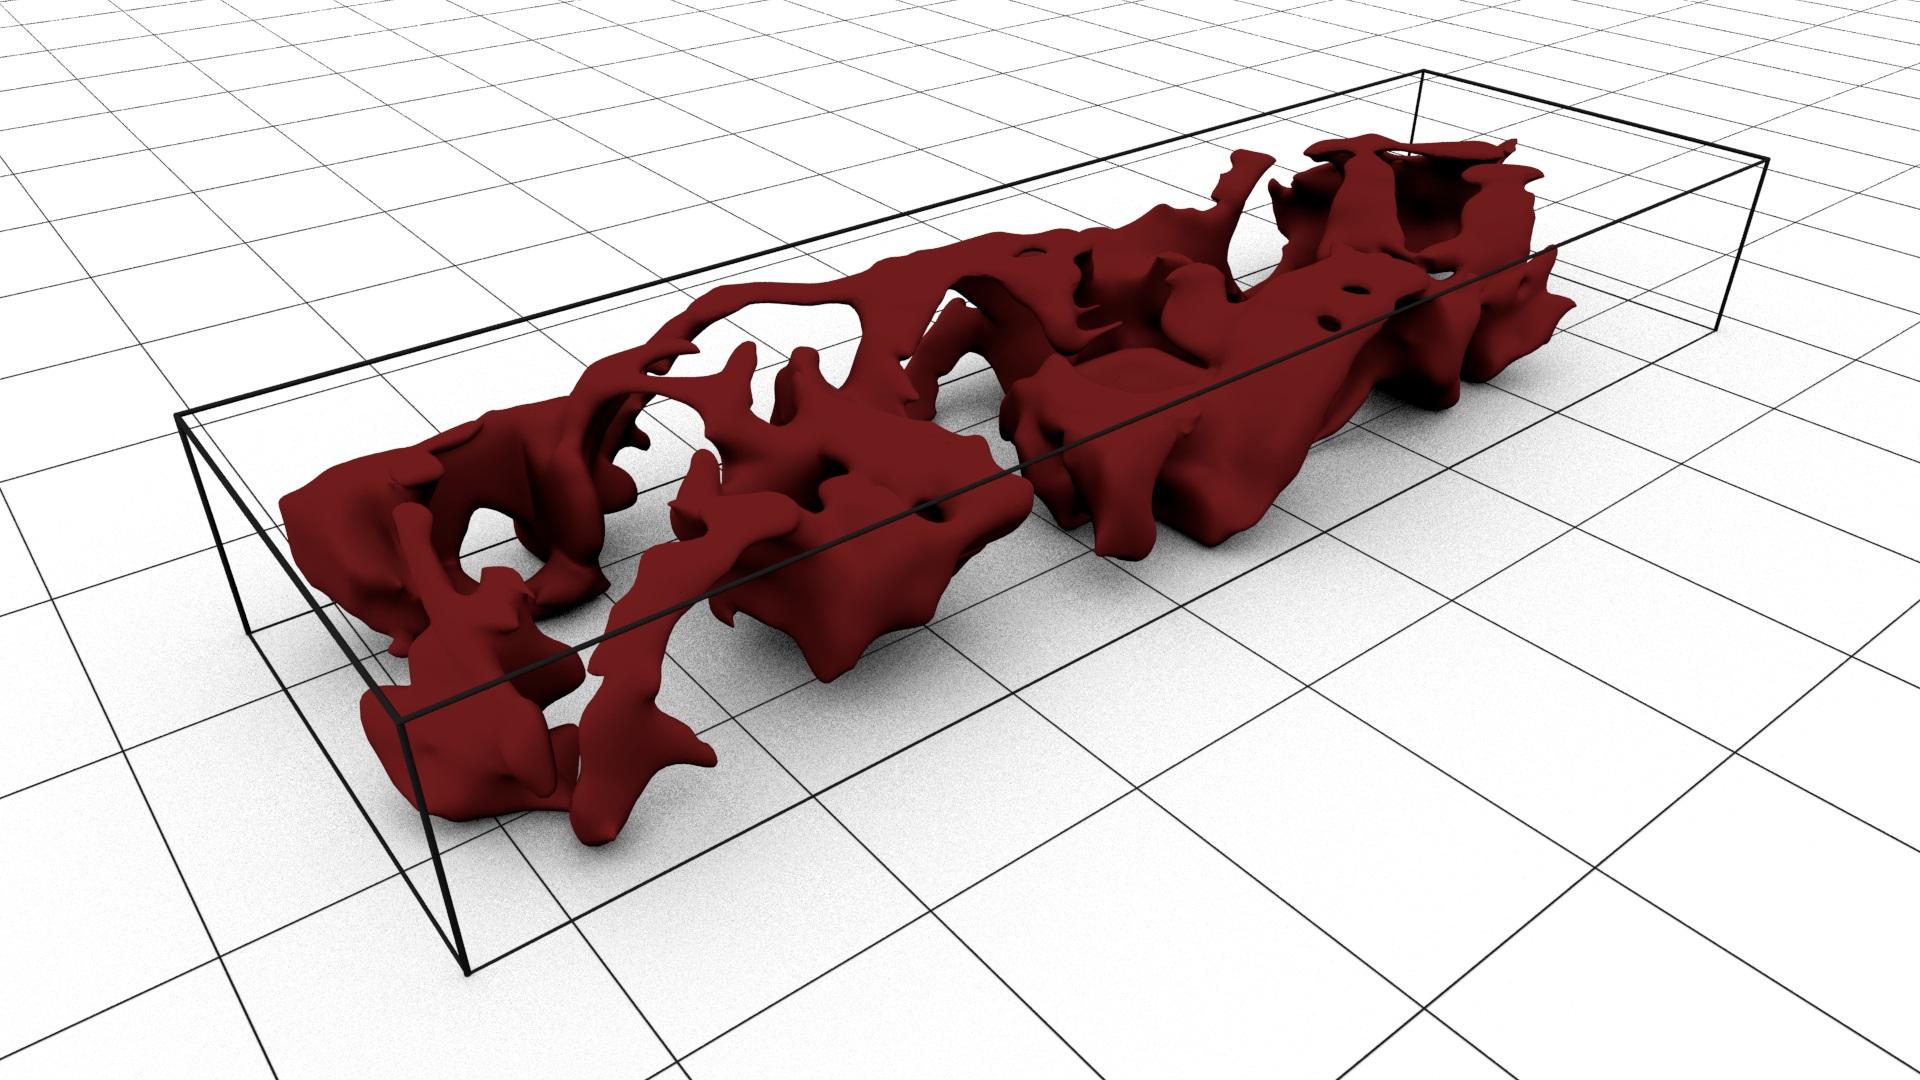 Structural Optimization Millipede - Rahul Girish